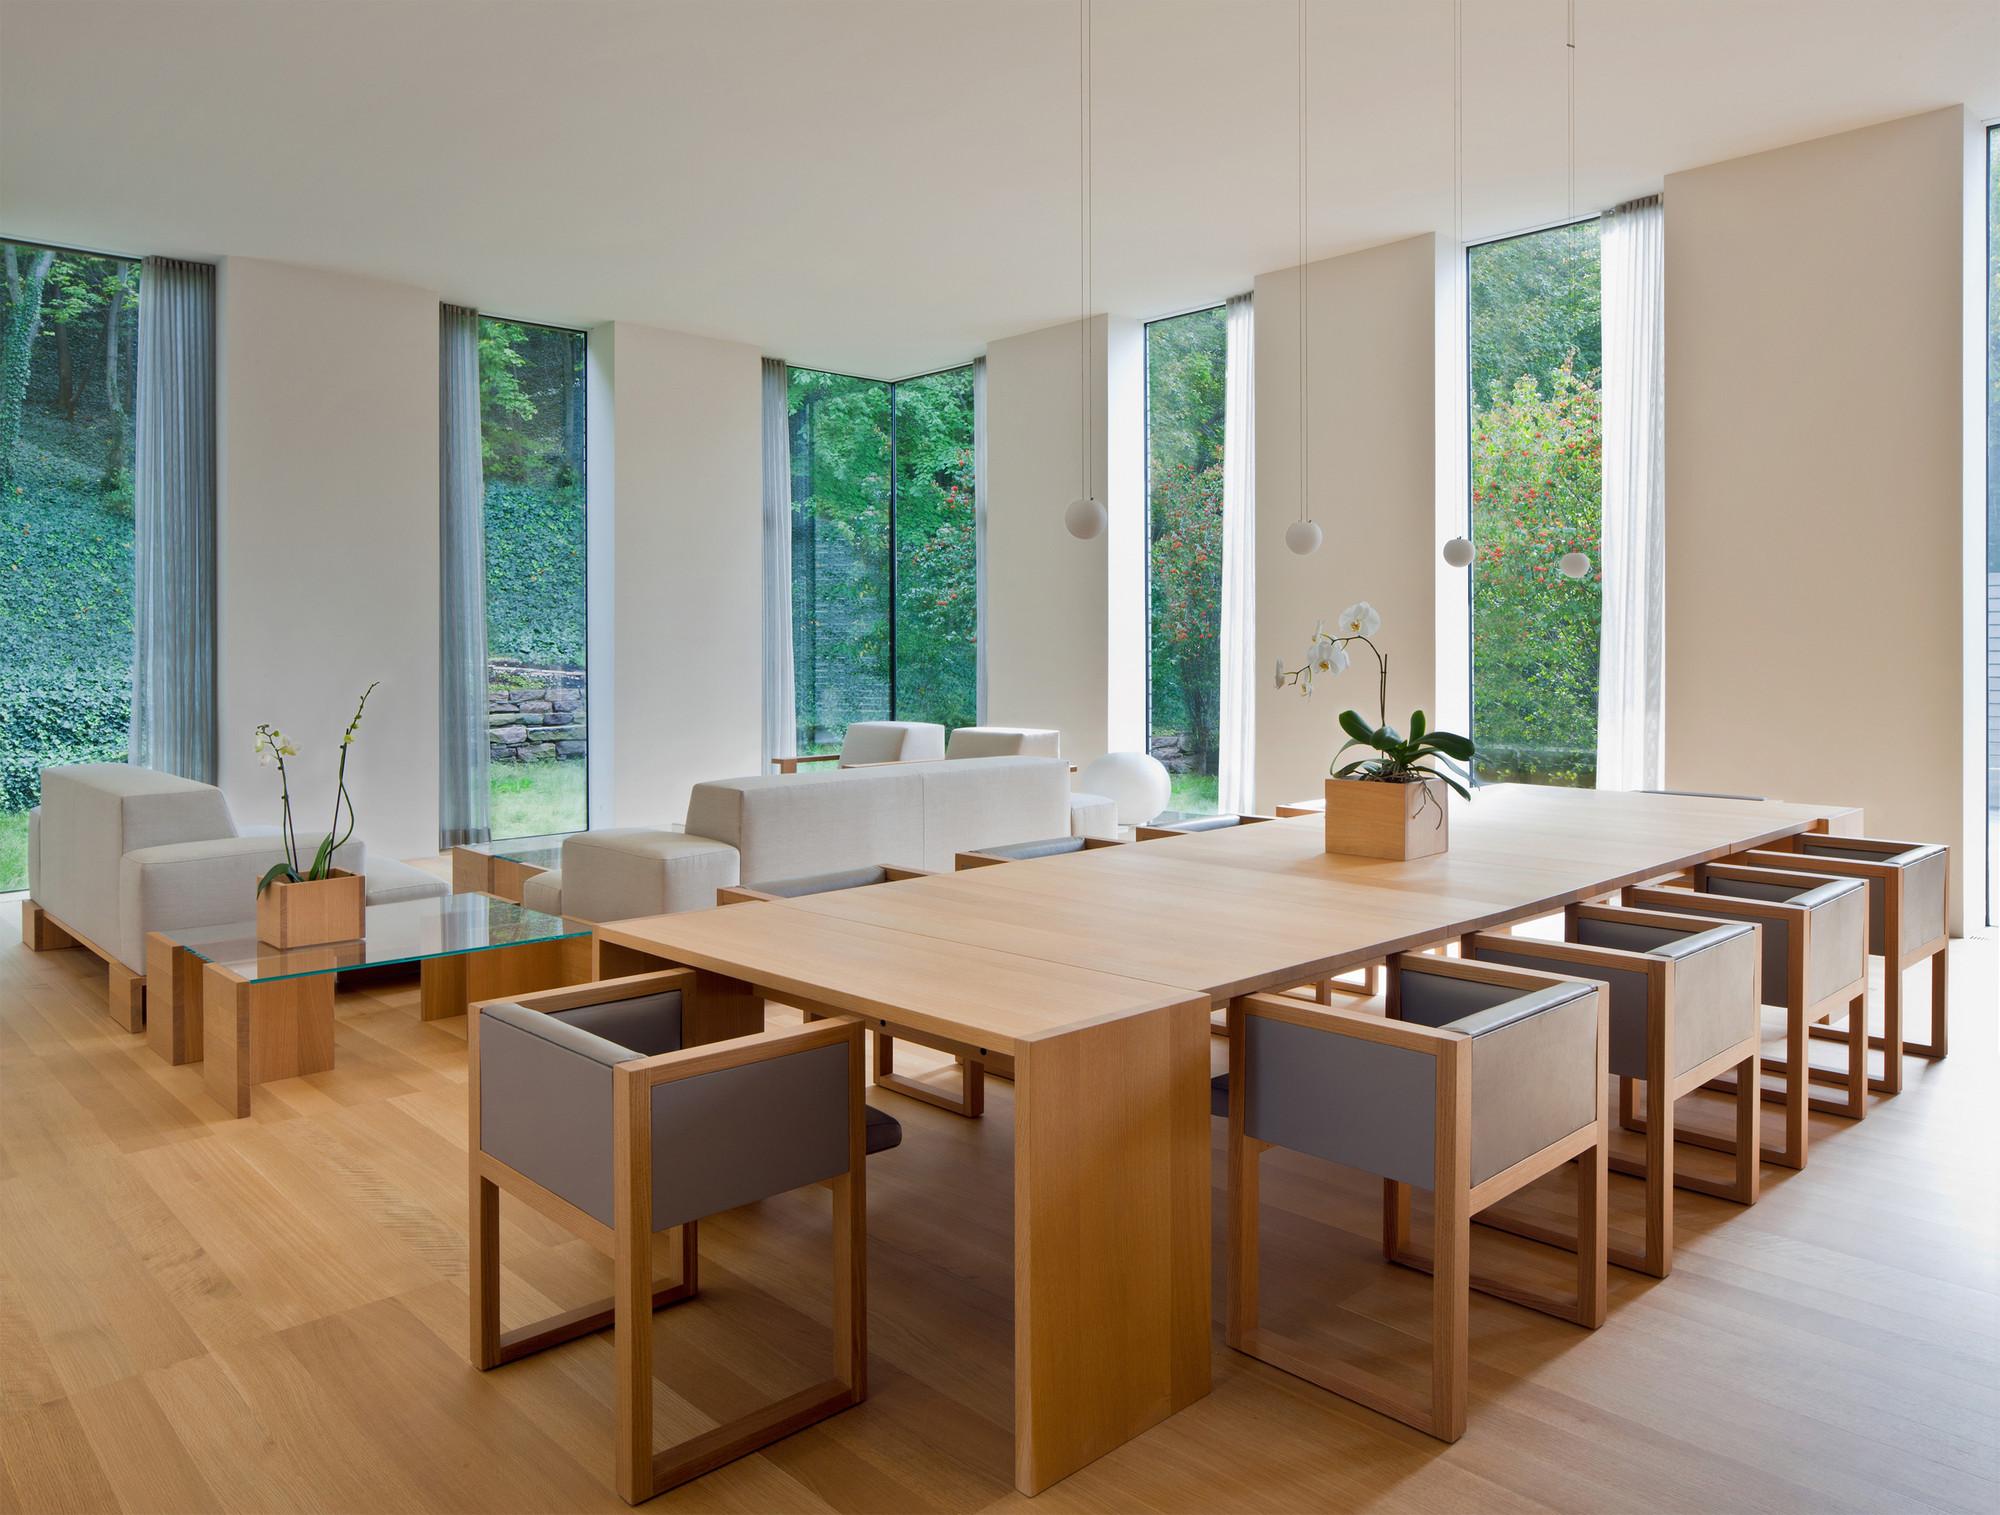 Fairview Townhouse / Bucchieri Architects